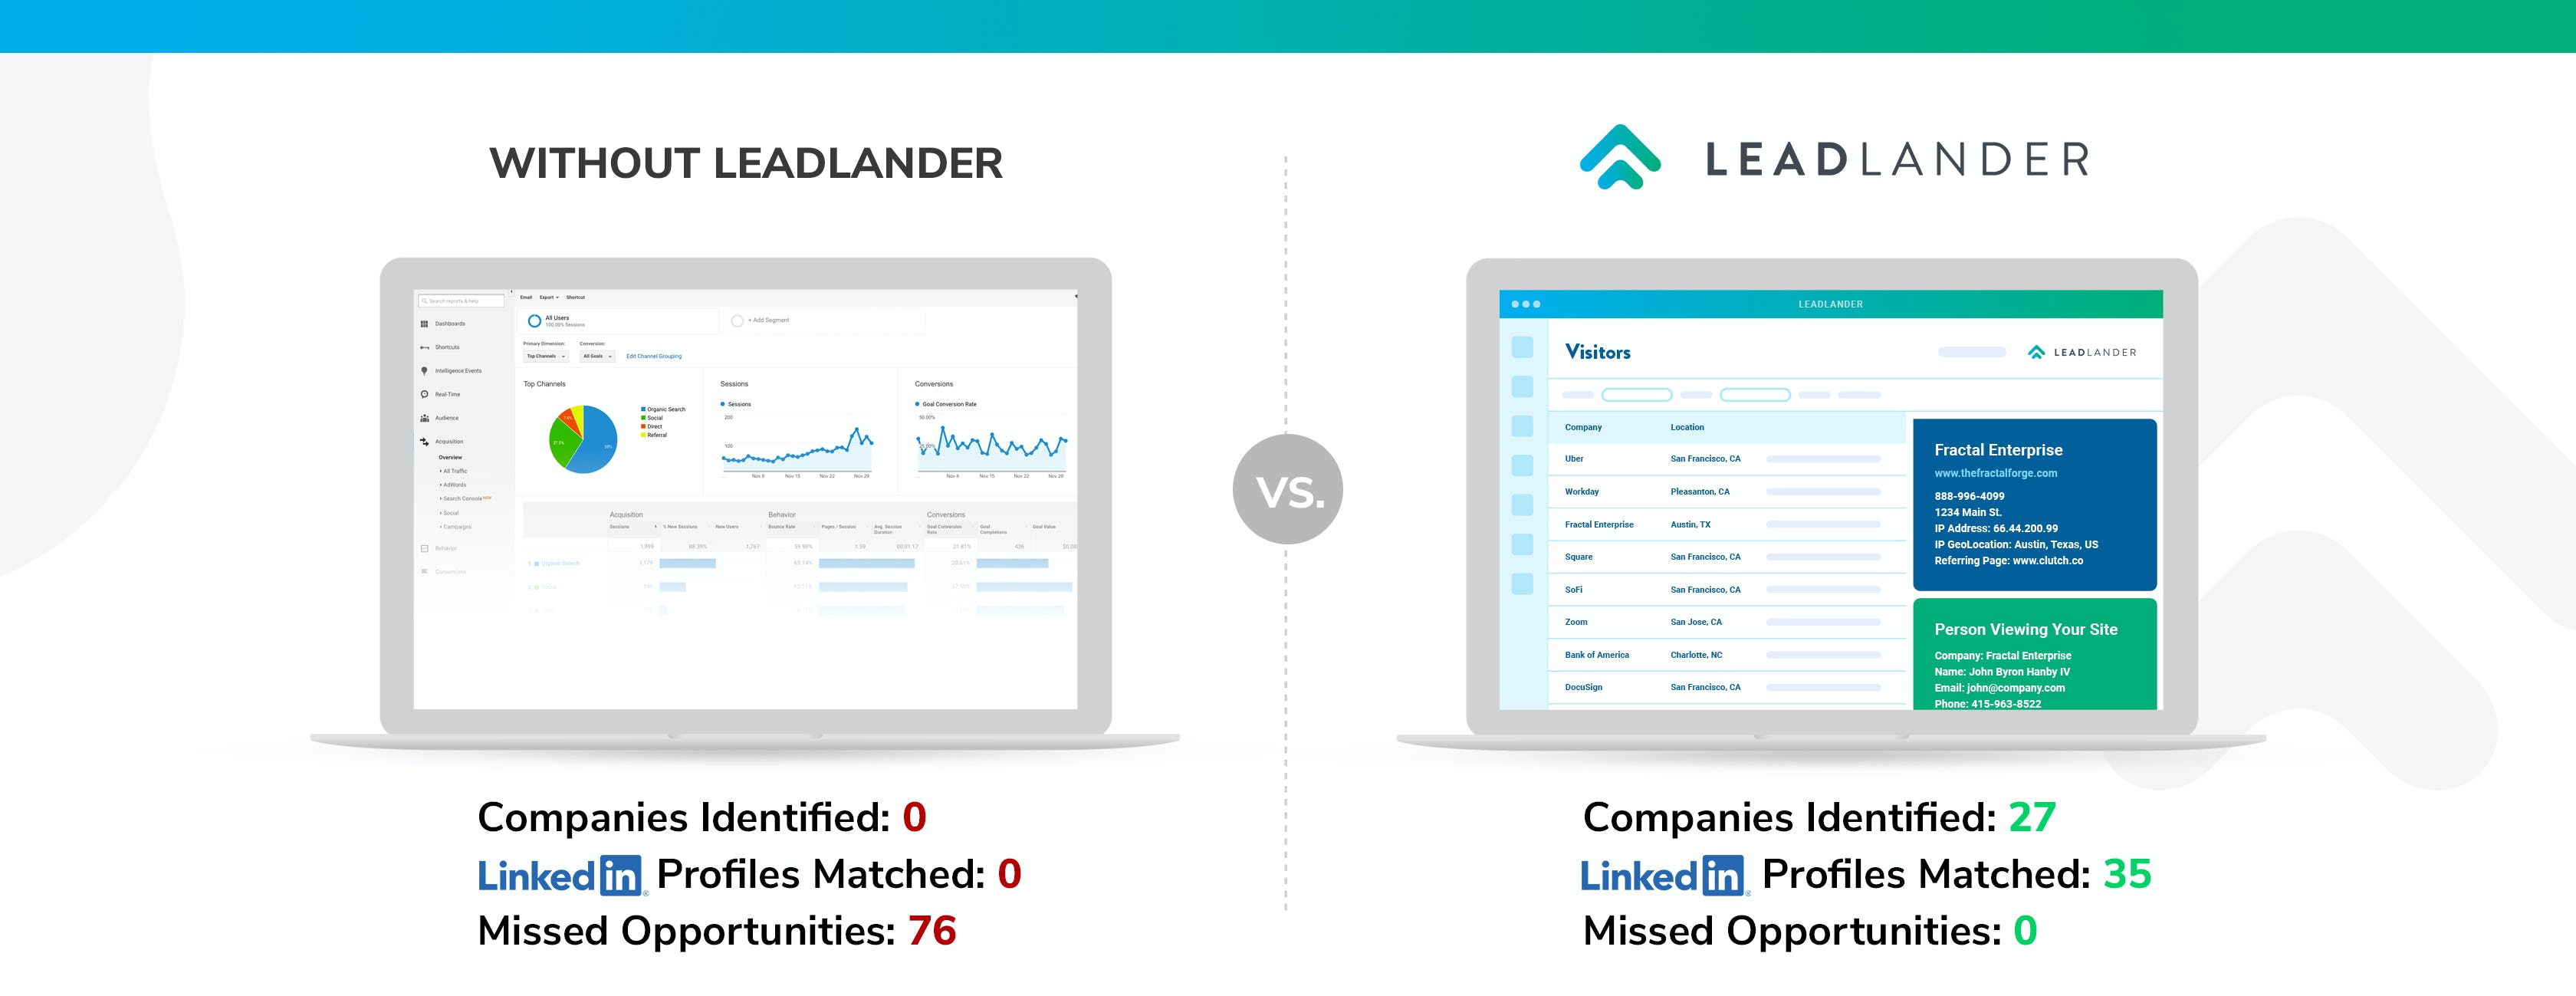 LeadLander Advantage